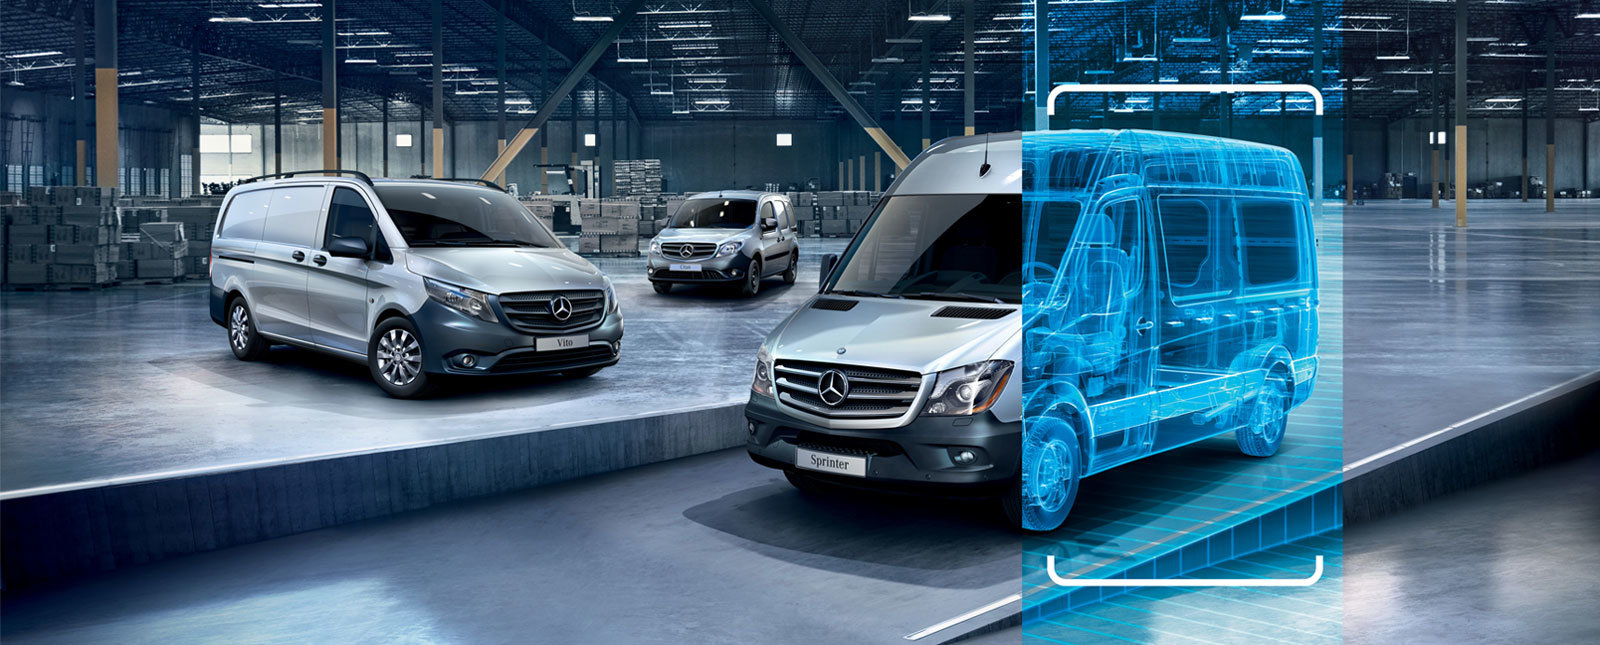 Mercedes Benz Junge Sterne Transporter bei Paul Passau